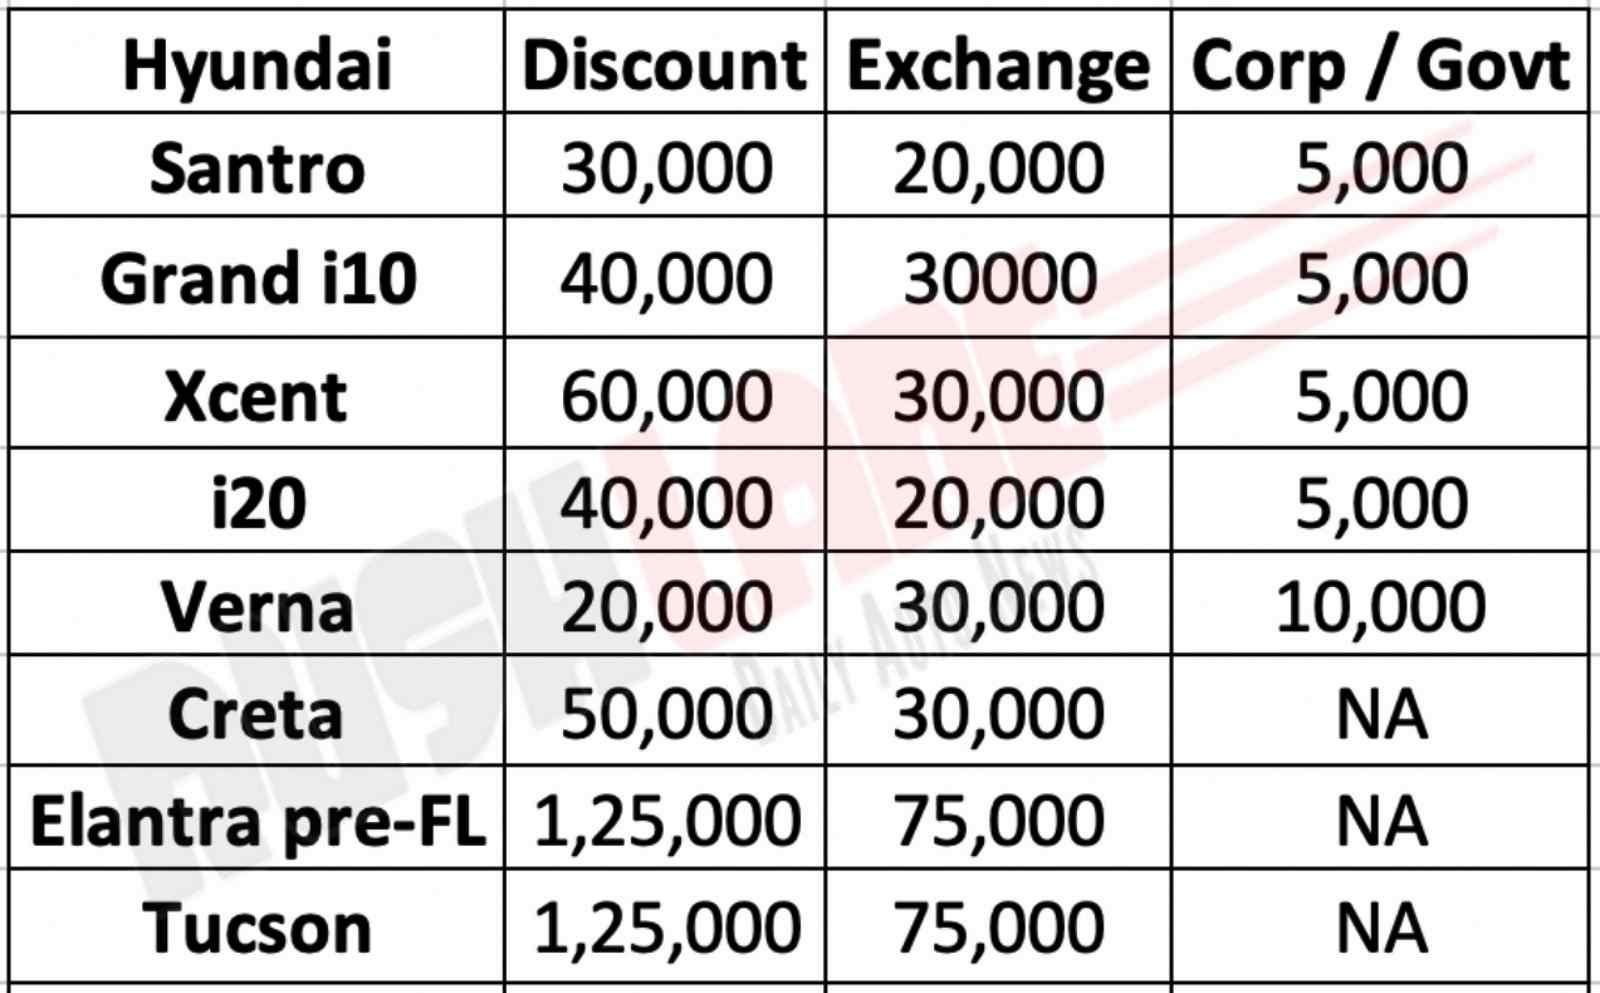 Hyundai car discounts Nov 2019